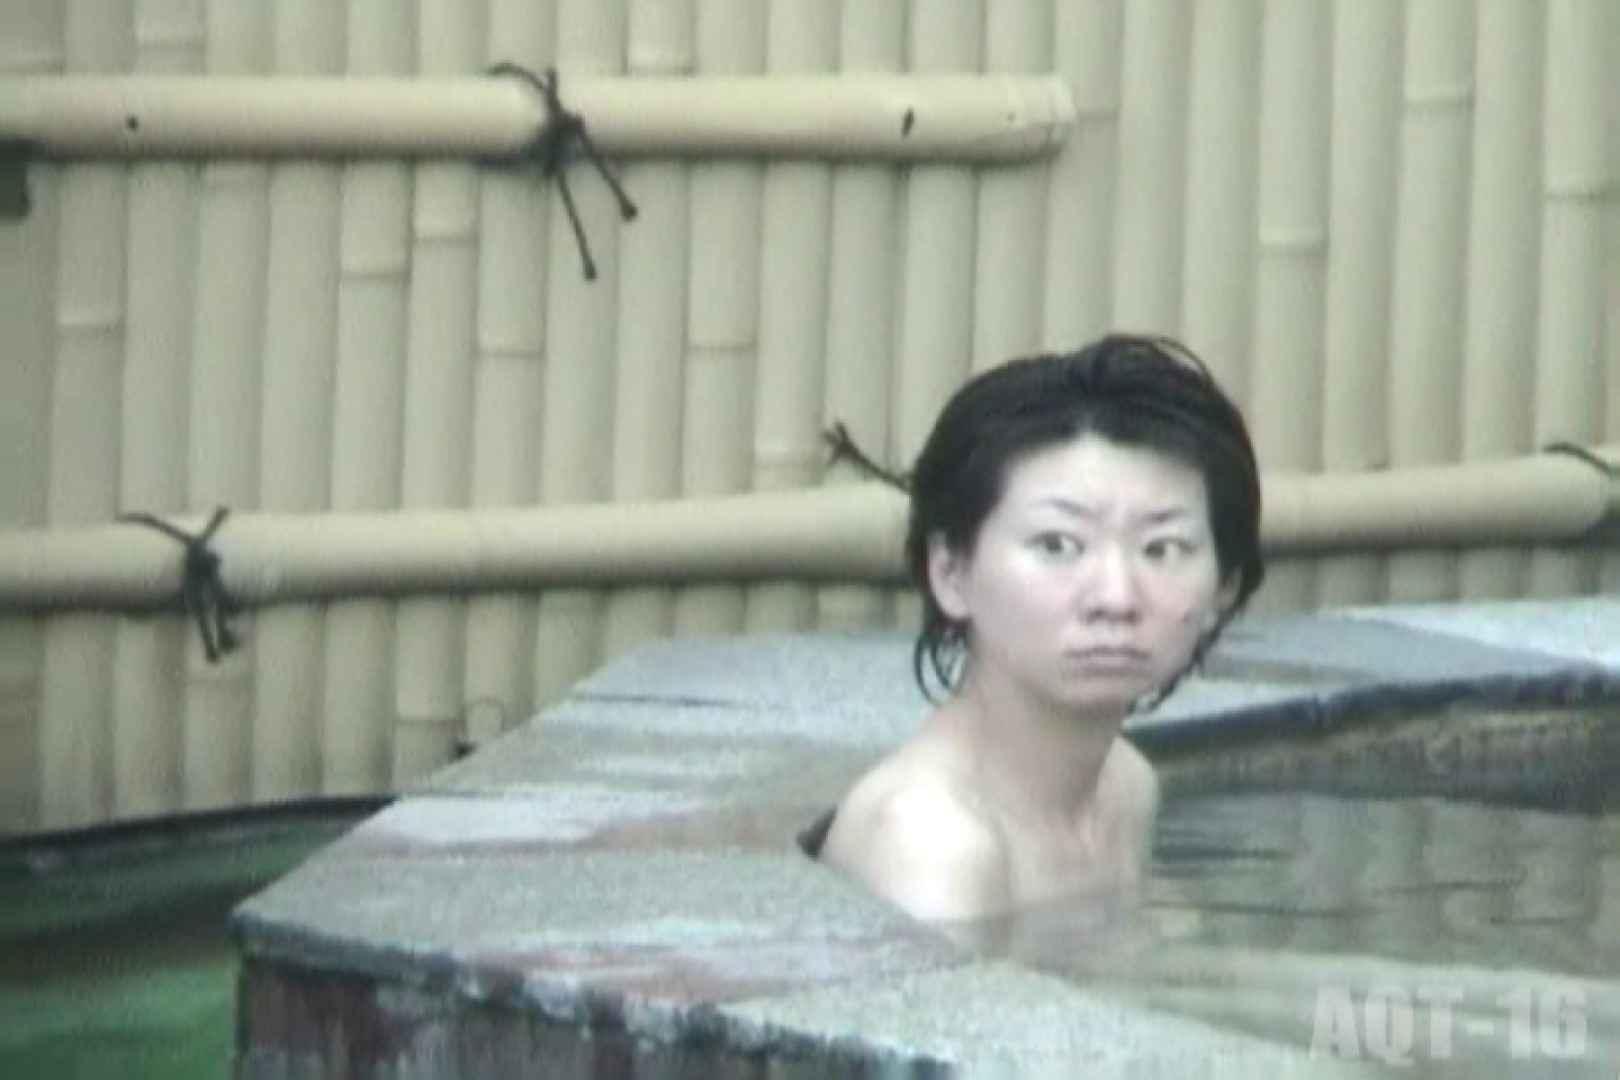 Aquaな露天風呂Vol.842 露天 オメコ無修正動画無料 44連発 17